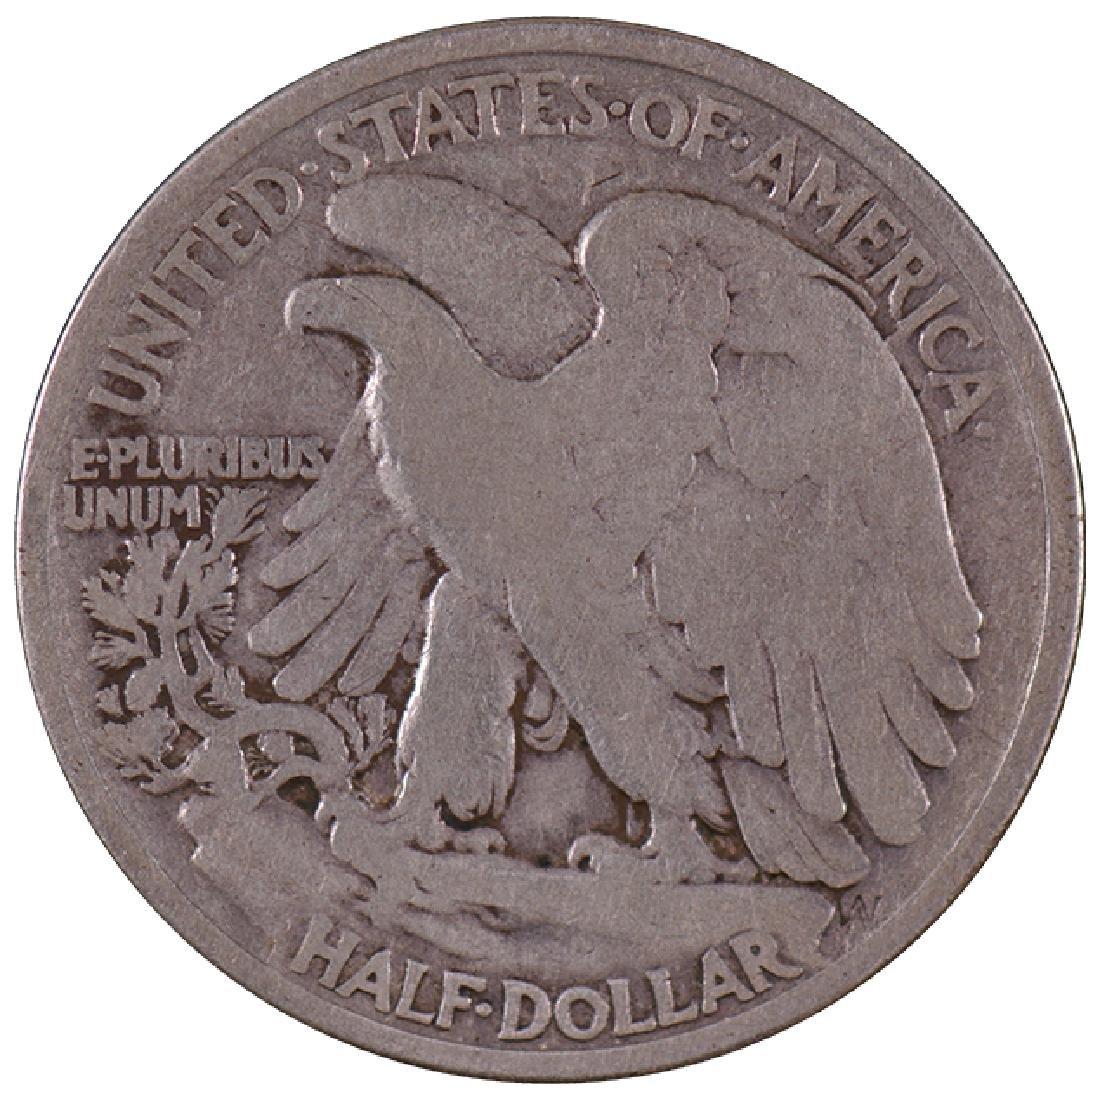 1921 Walking Liberty Half Dollar Coin - 2